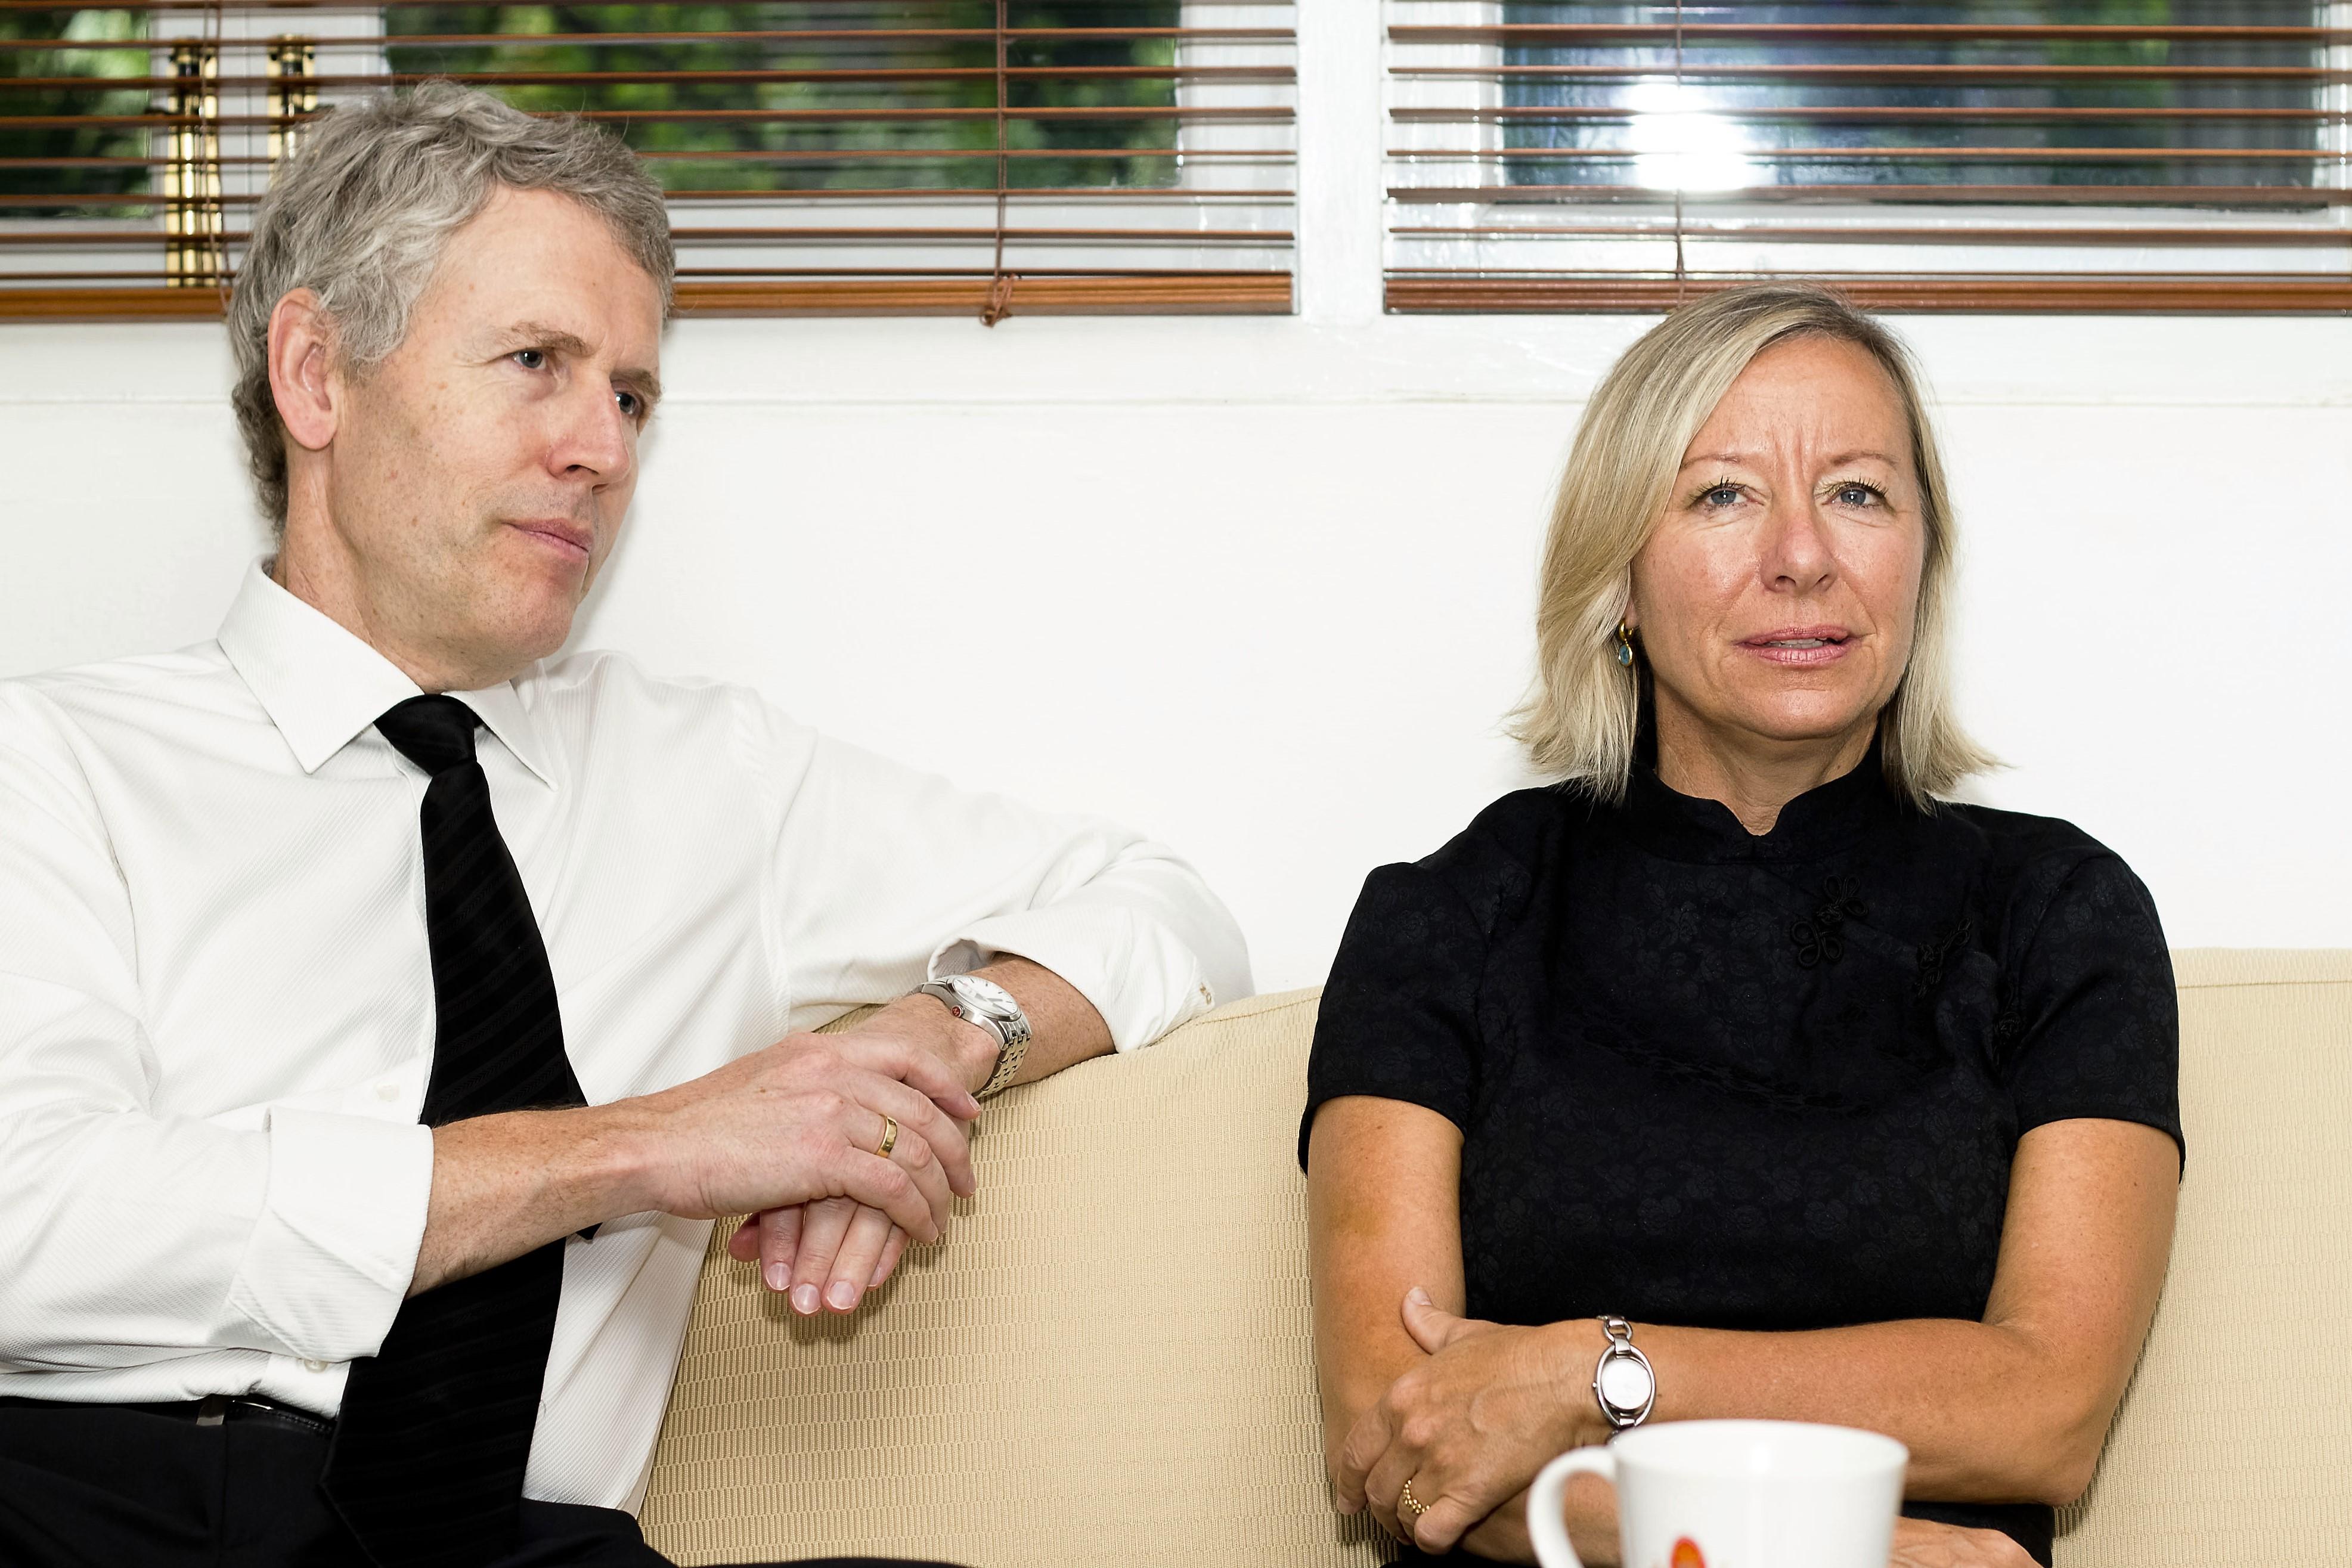 Danish Ambassador Uffe Wolffhechel and wife Susie A. Ruff